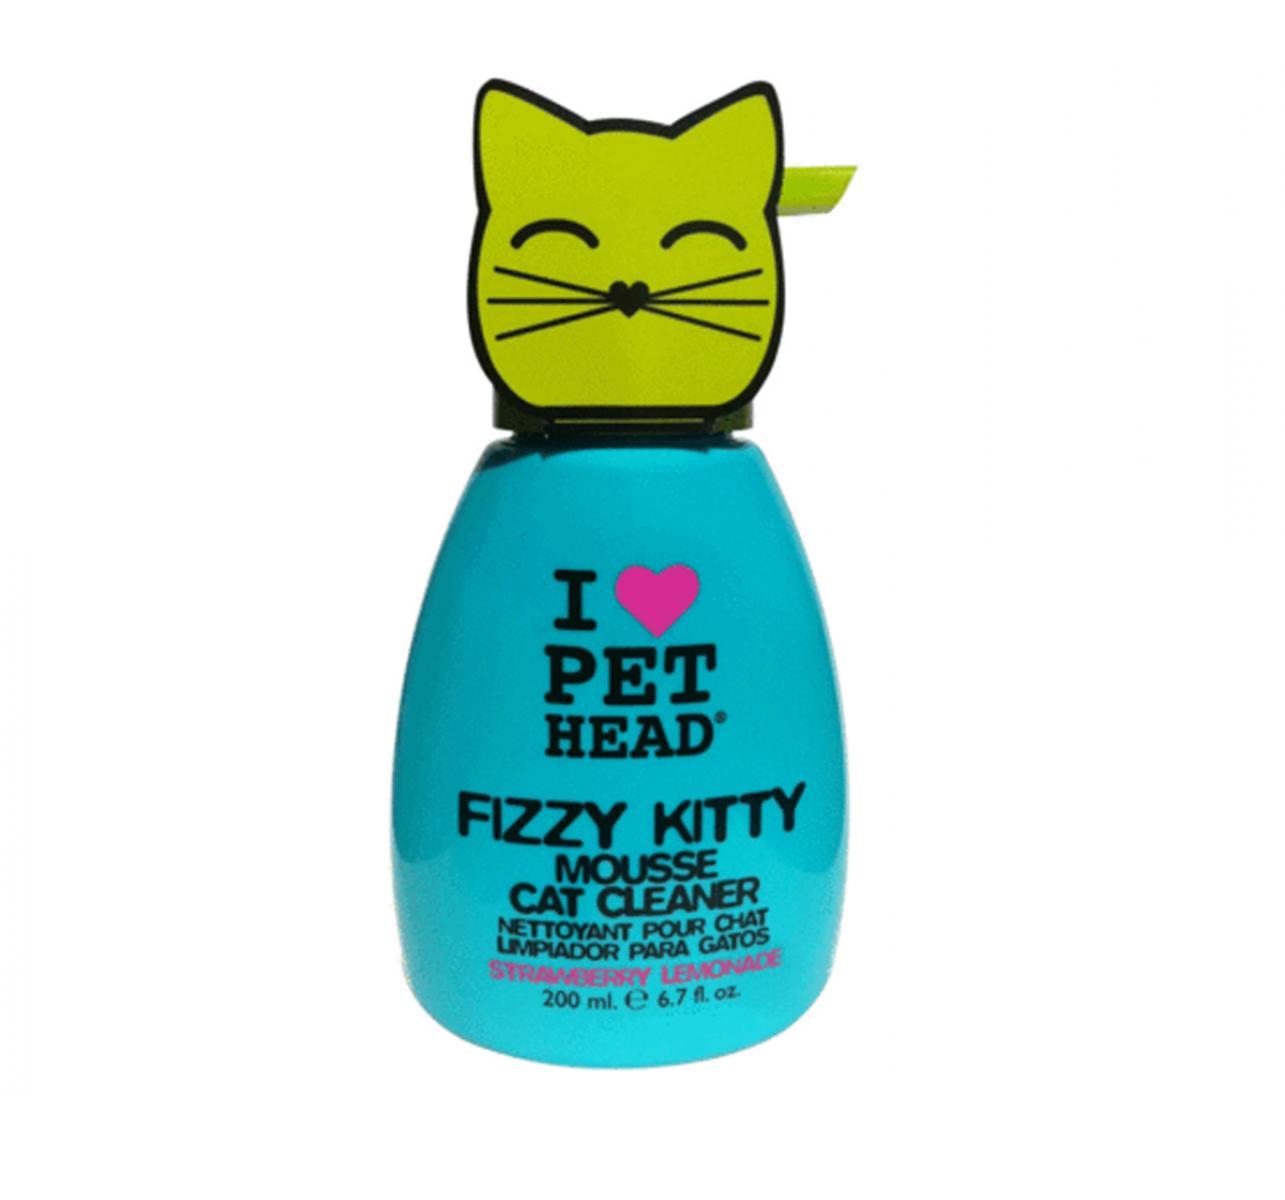 Pet Head Cat Fizzy Kitty Strawberry Lemonade Mousse Cat Cleaner - 200ml